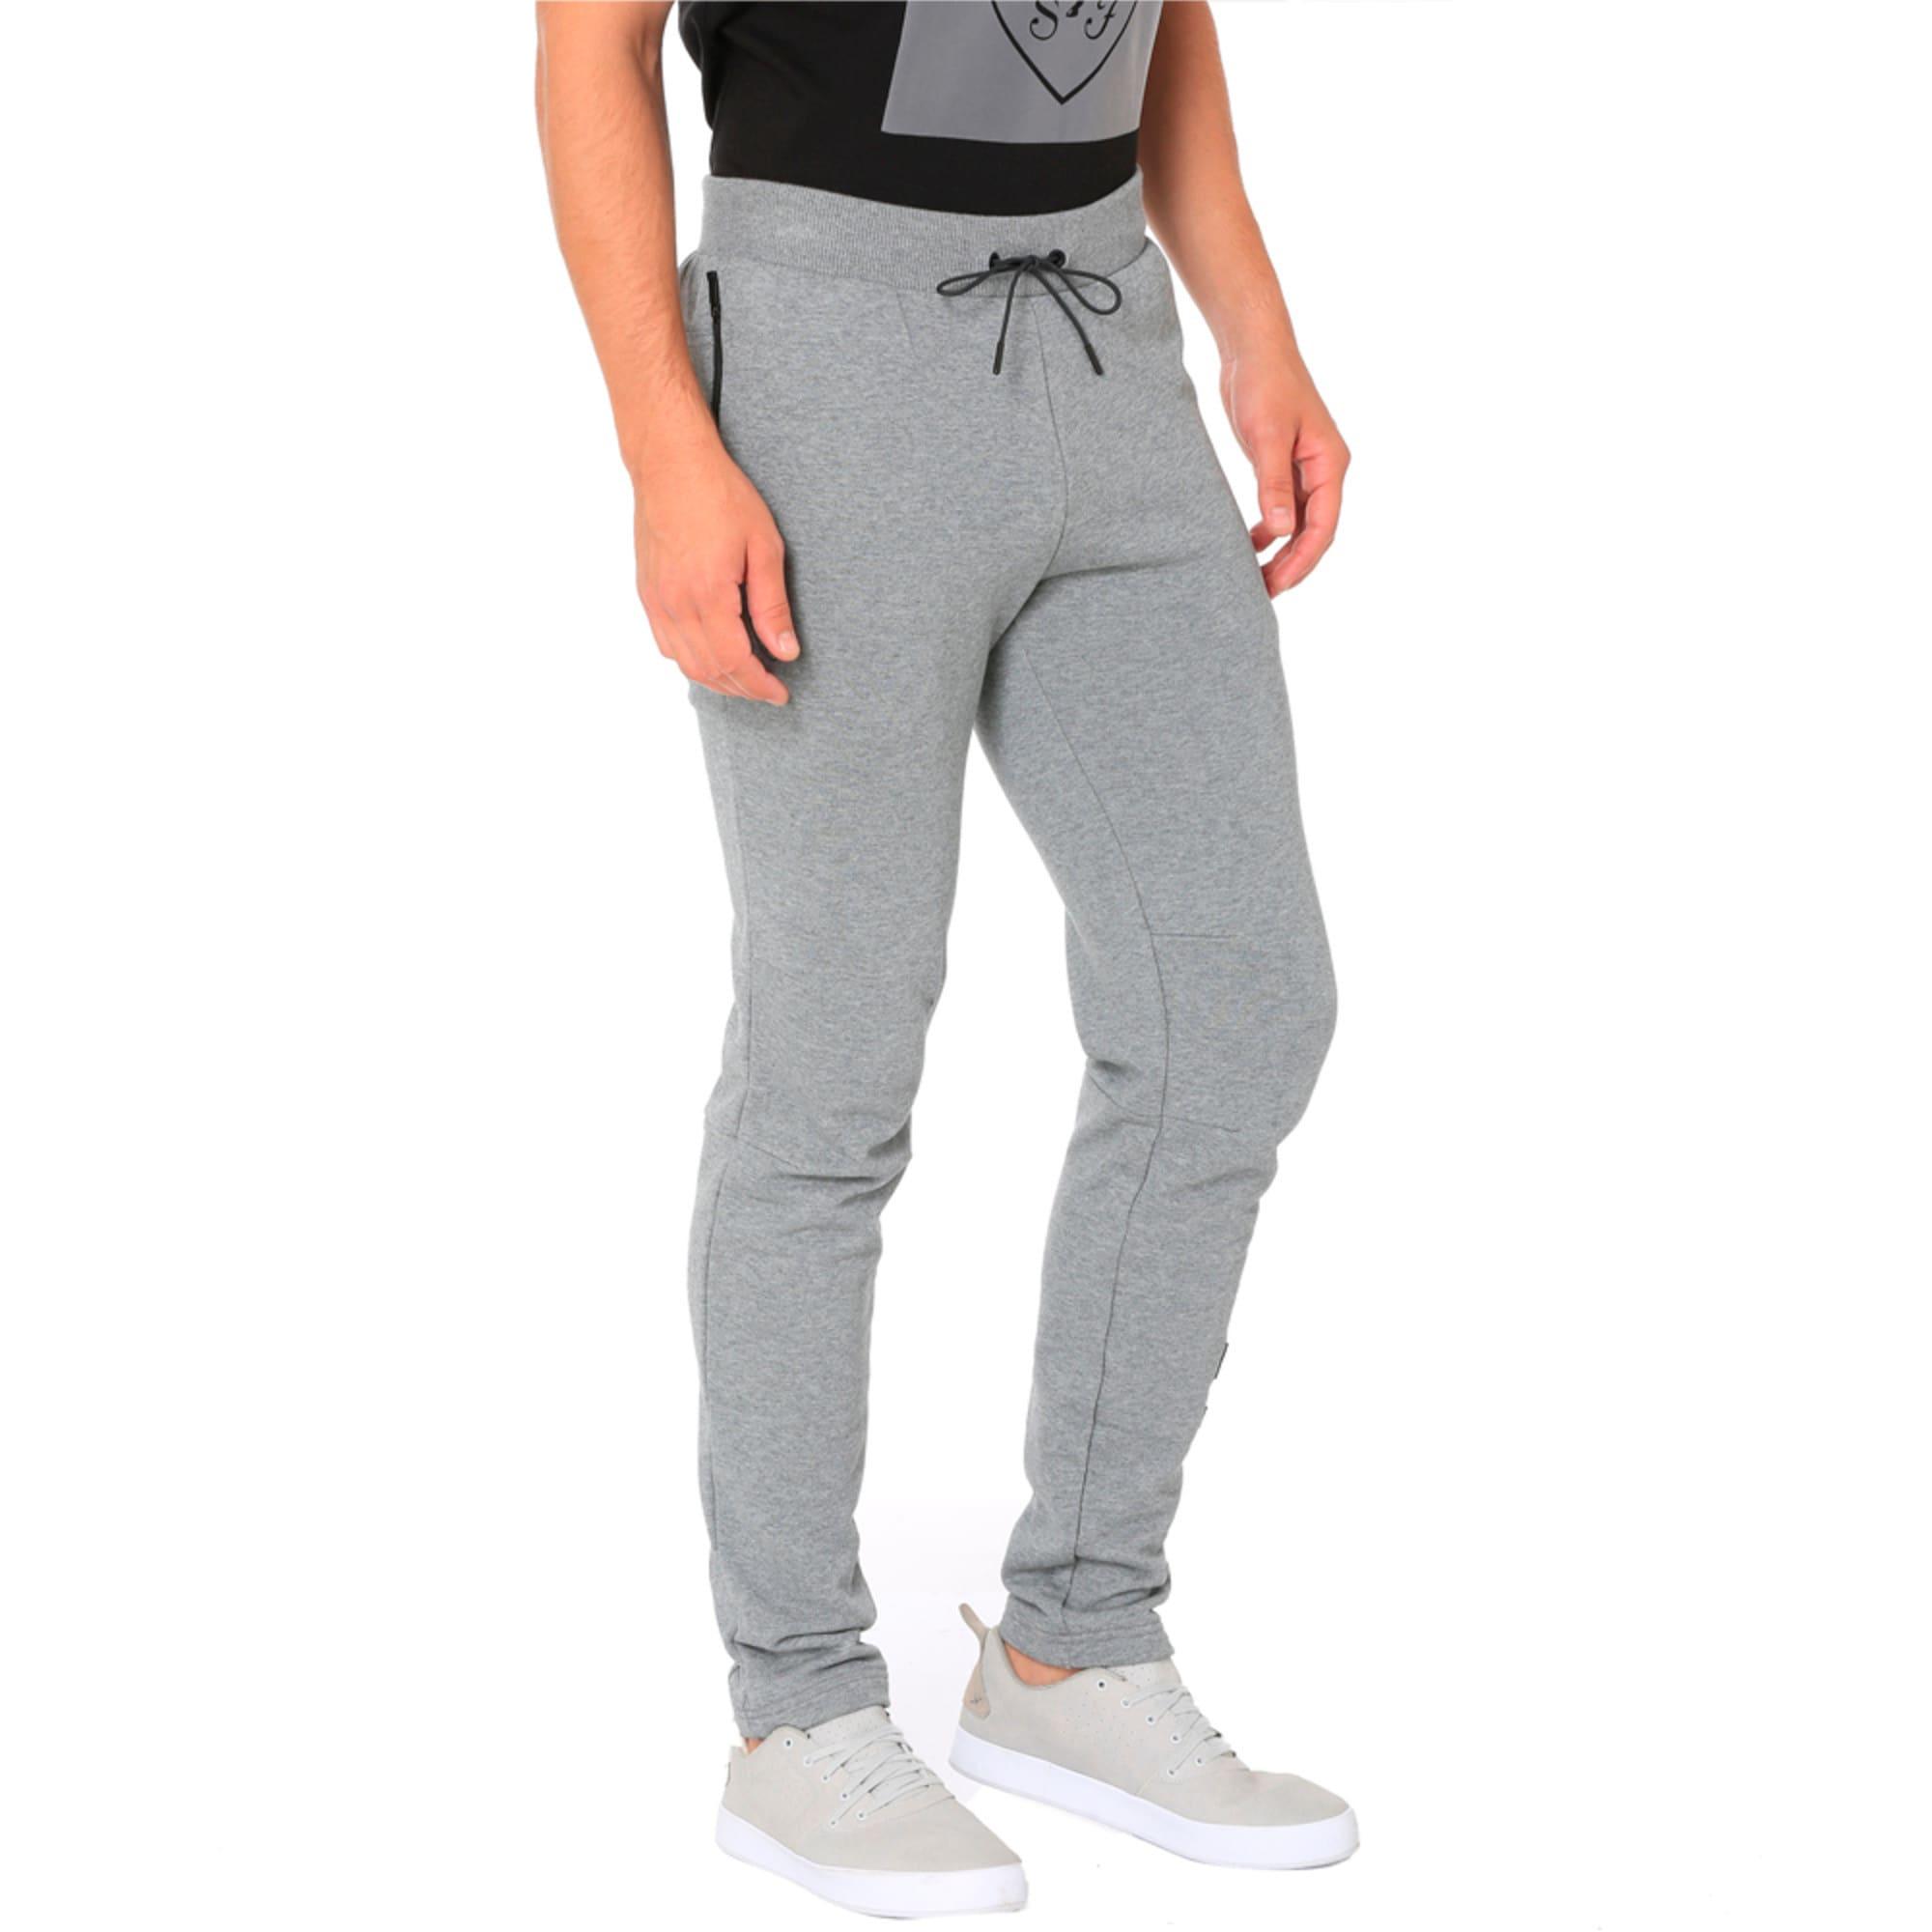 Thumbnail 5 of Ferrari Lifestyle Men's Sweatpants, Medium Gray Heather, medium-IND